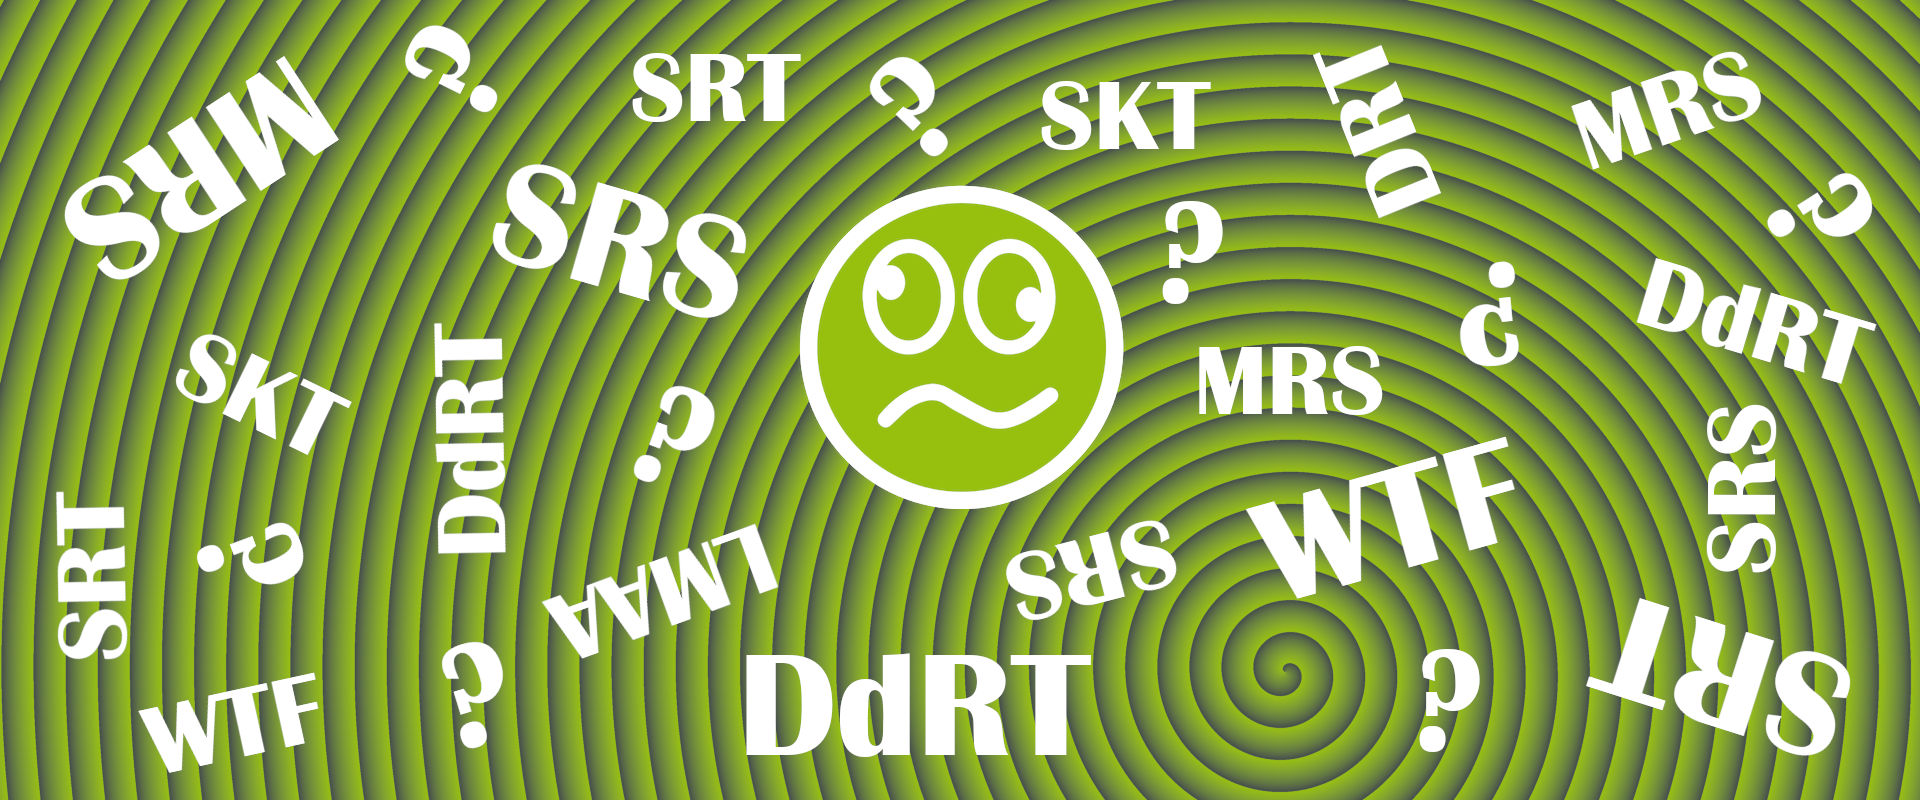 Permalink zu:SRT, DdRT, SRS, MRS: Ja, was denn nun?!